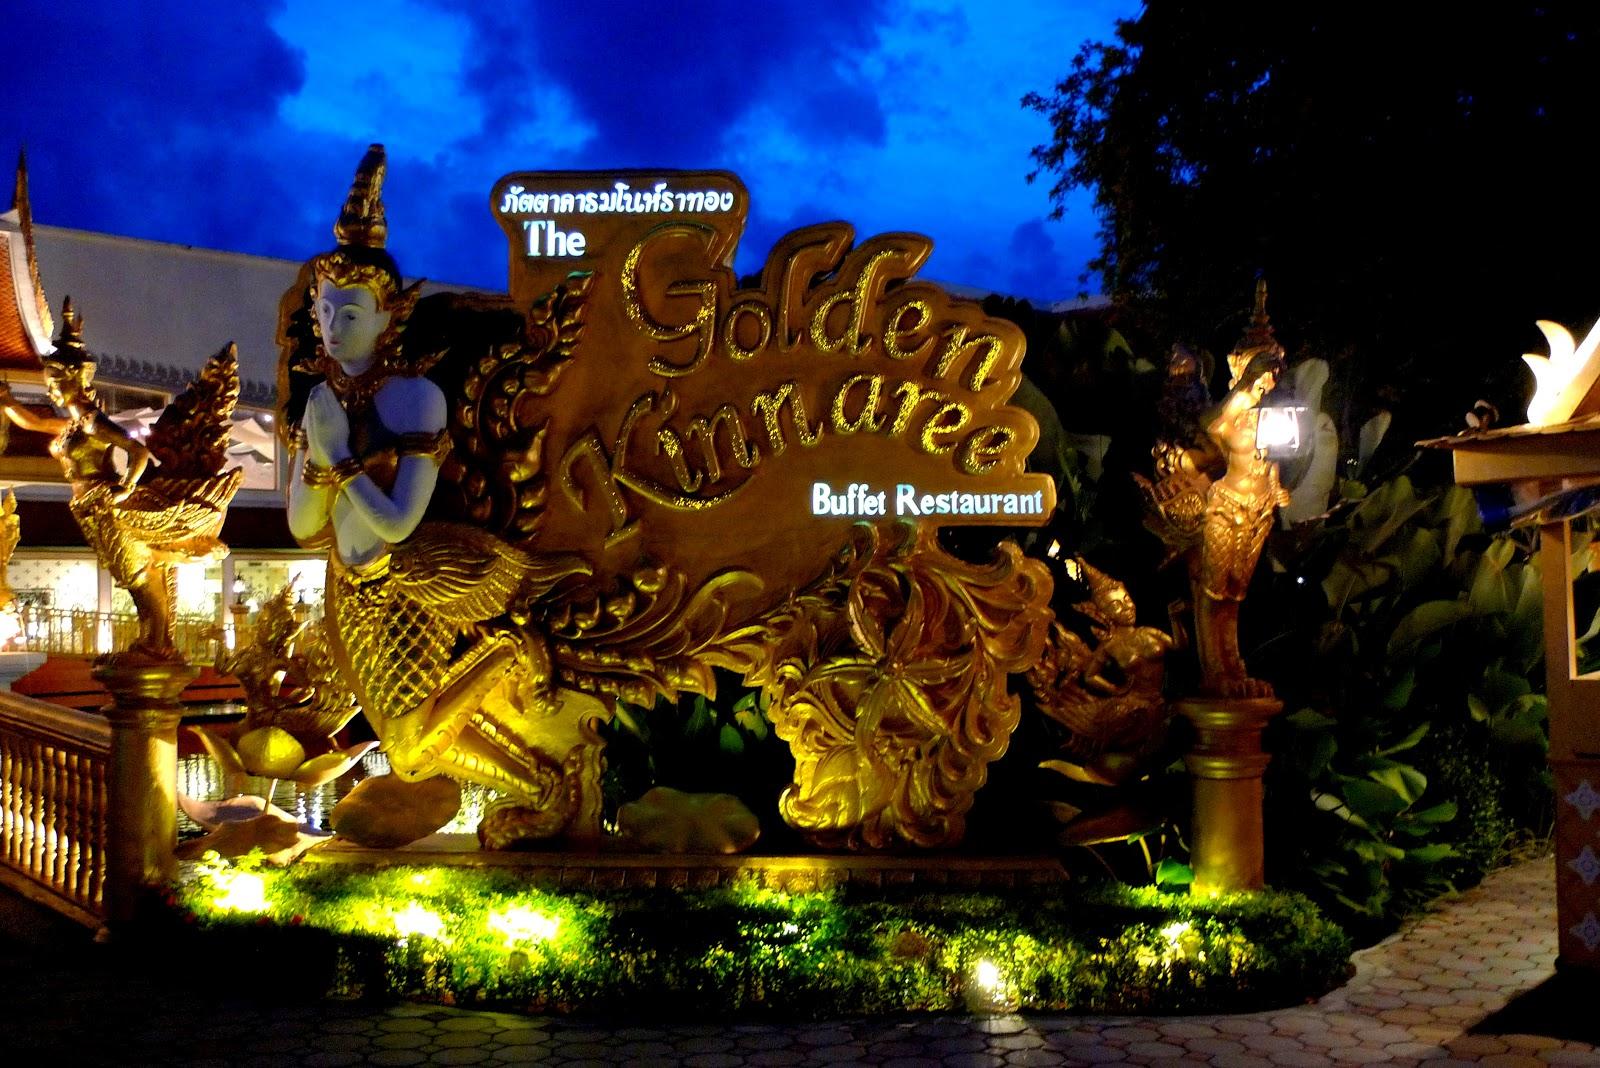 exploring phuket essay Phuket vegetarian festival: procession for jui tui shrine (photo essay) phuket vegetarian festival: phuket thailand, thailand travel, thailand adventure, cultural events, worship, exploring, traveling, paradise vegetarian vegetarian festival, photo essay, phuket, double space.